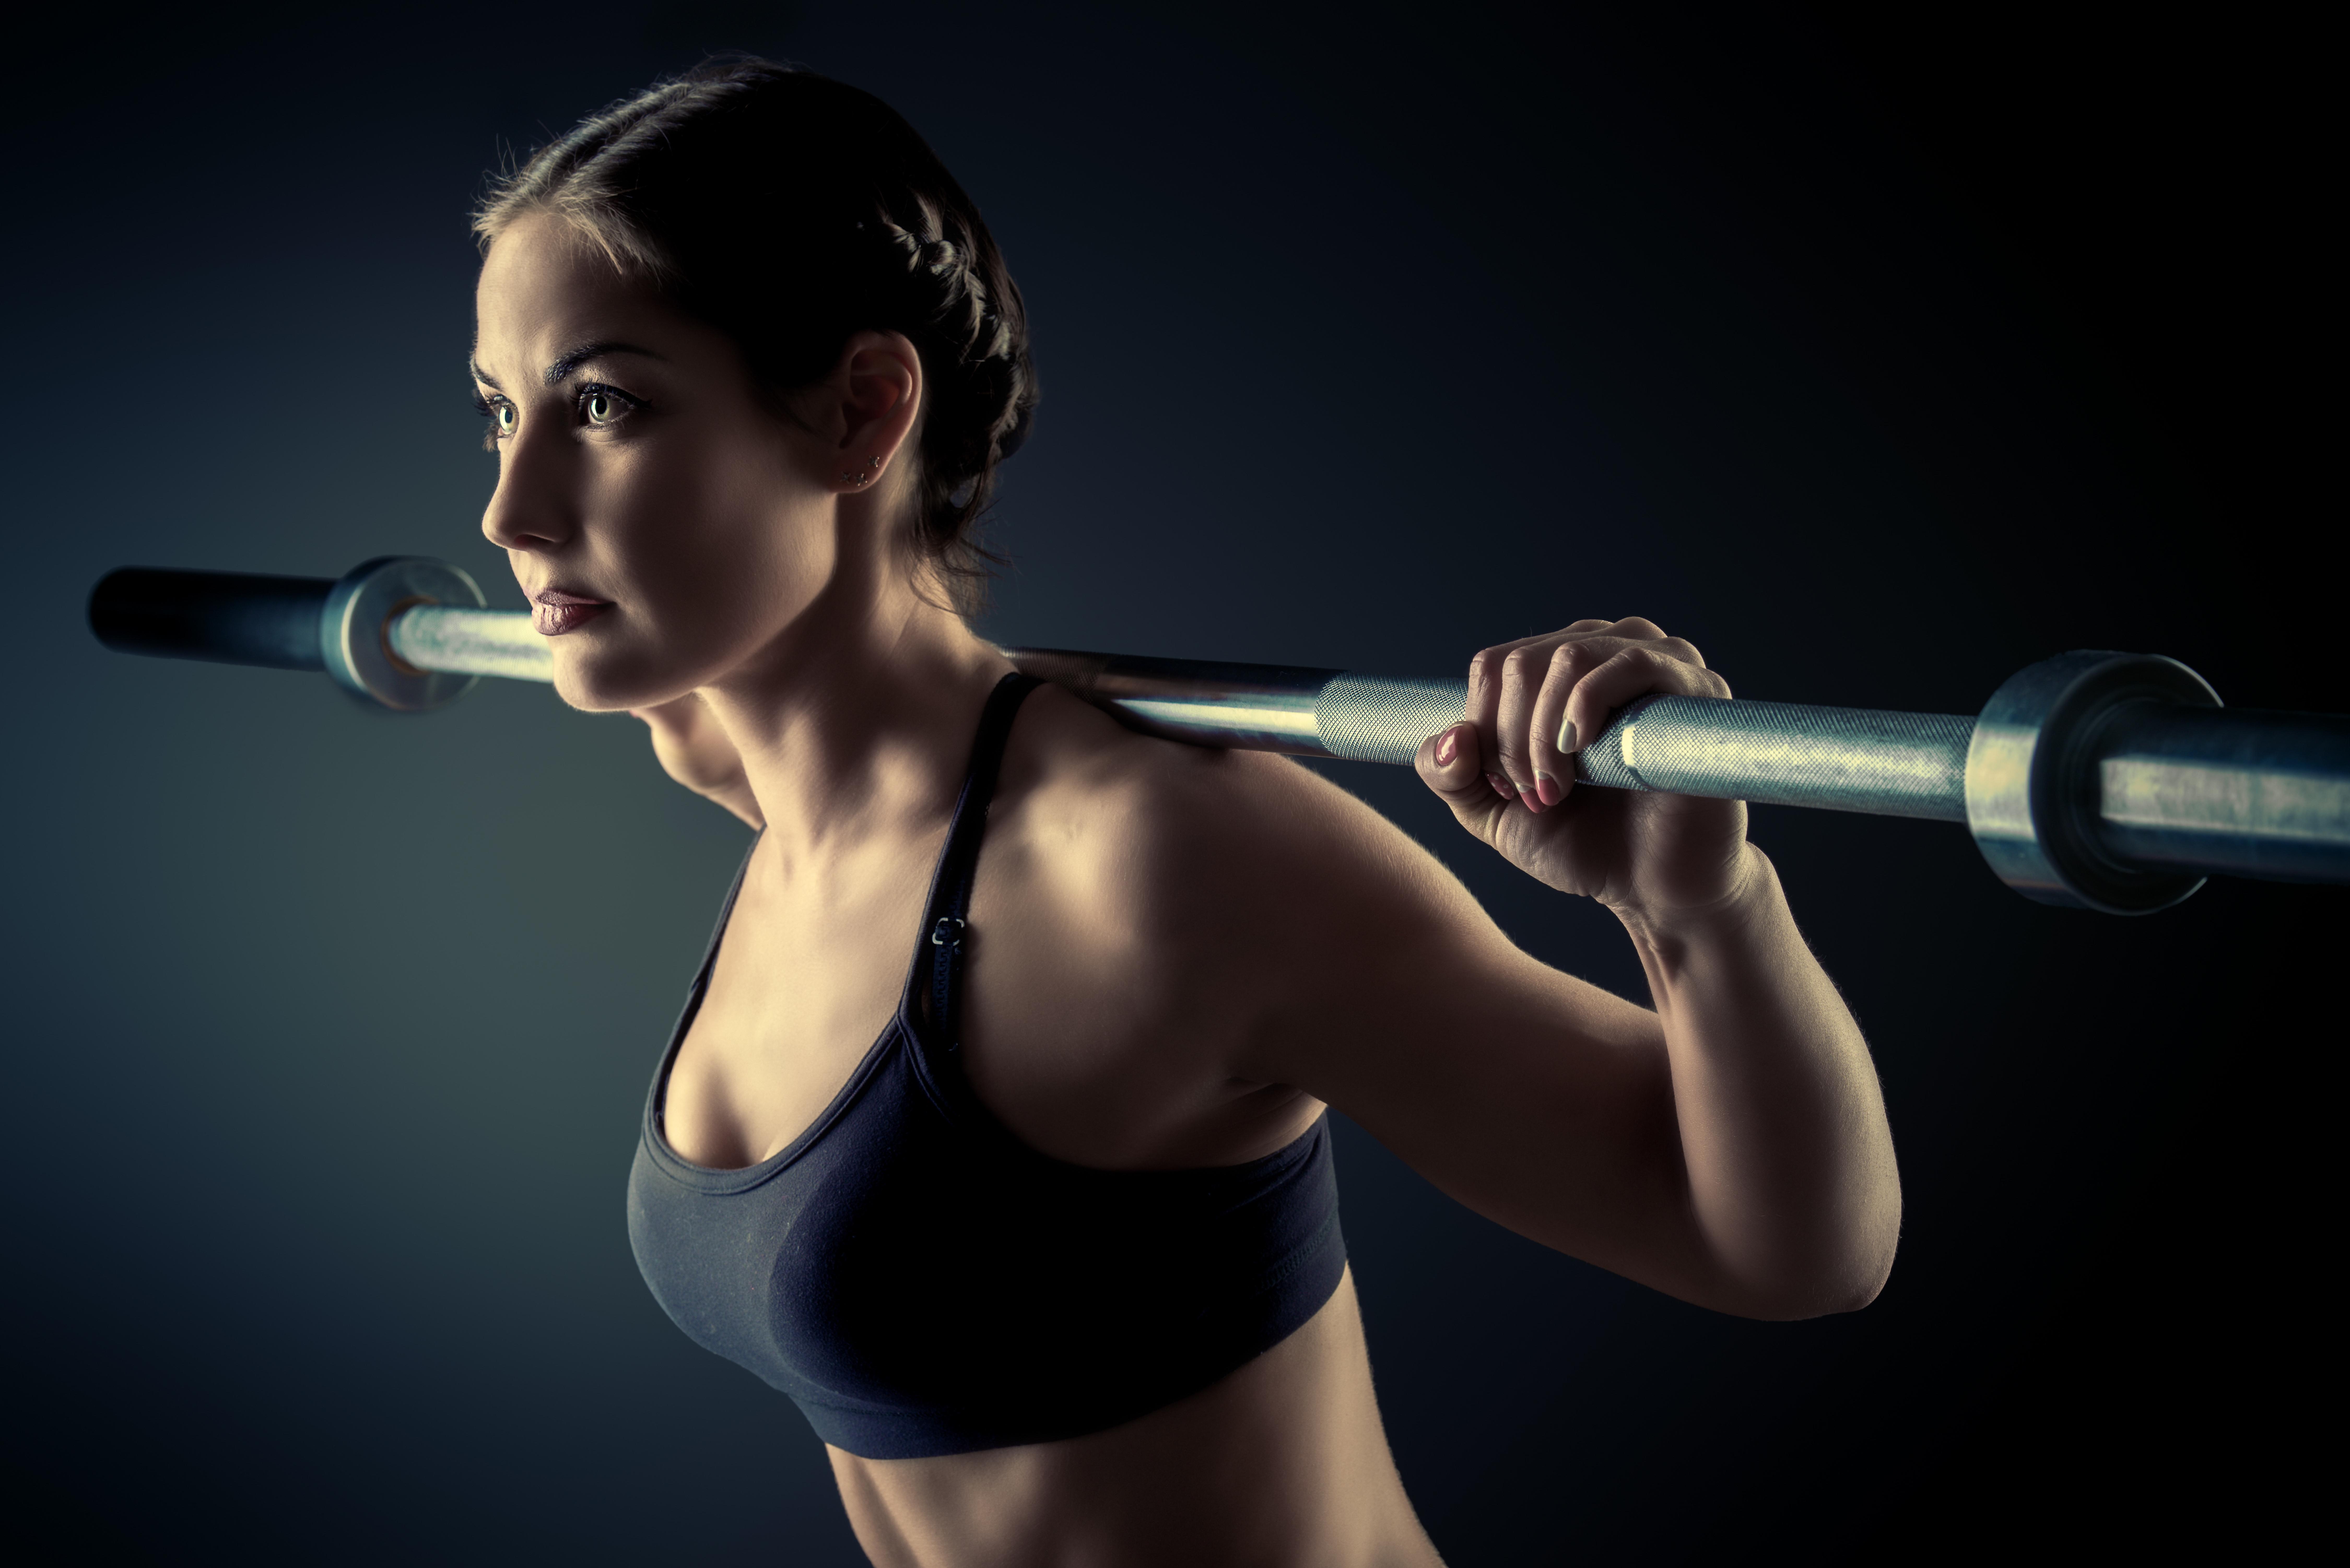 Fitness 8k Ultra HD Wallpaper Background Image 9000x6006 ID 9000x6006